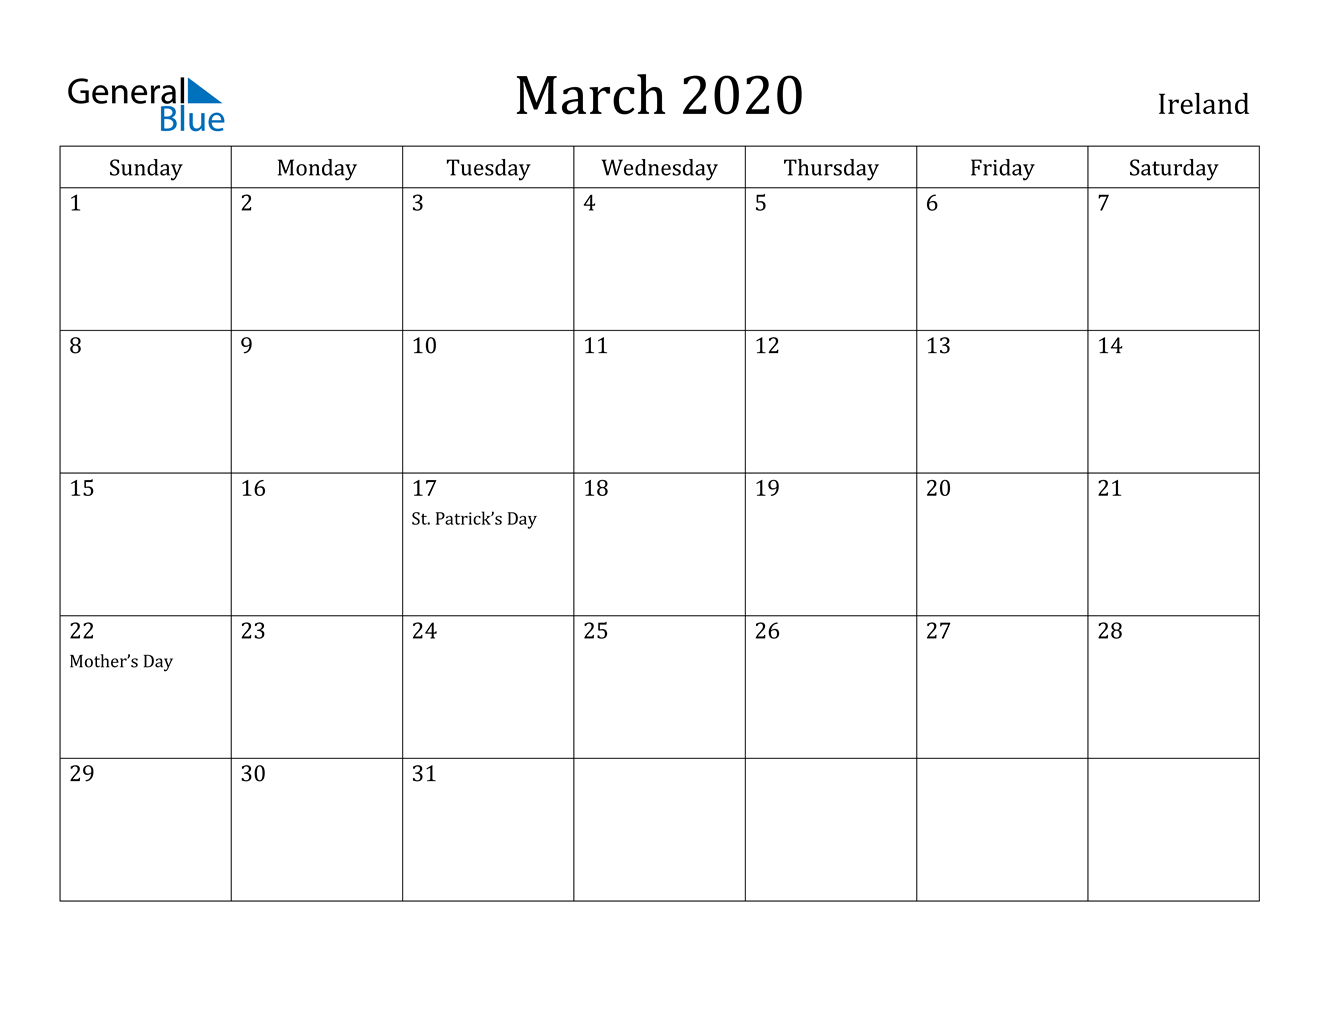 Image of March 2020 Ireland Calendar with Holidays Calendar